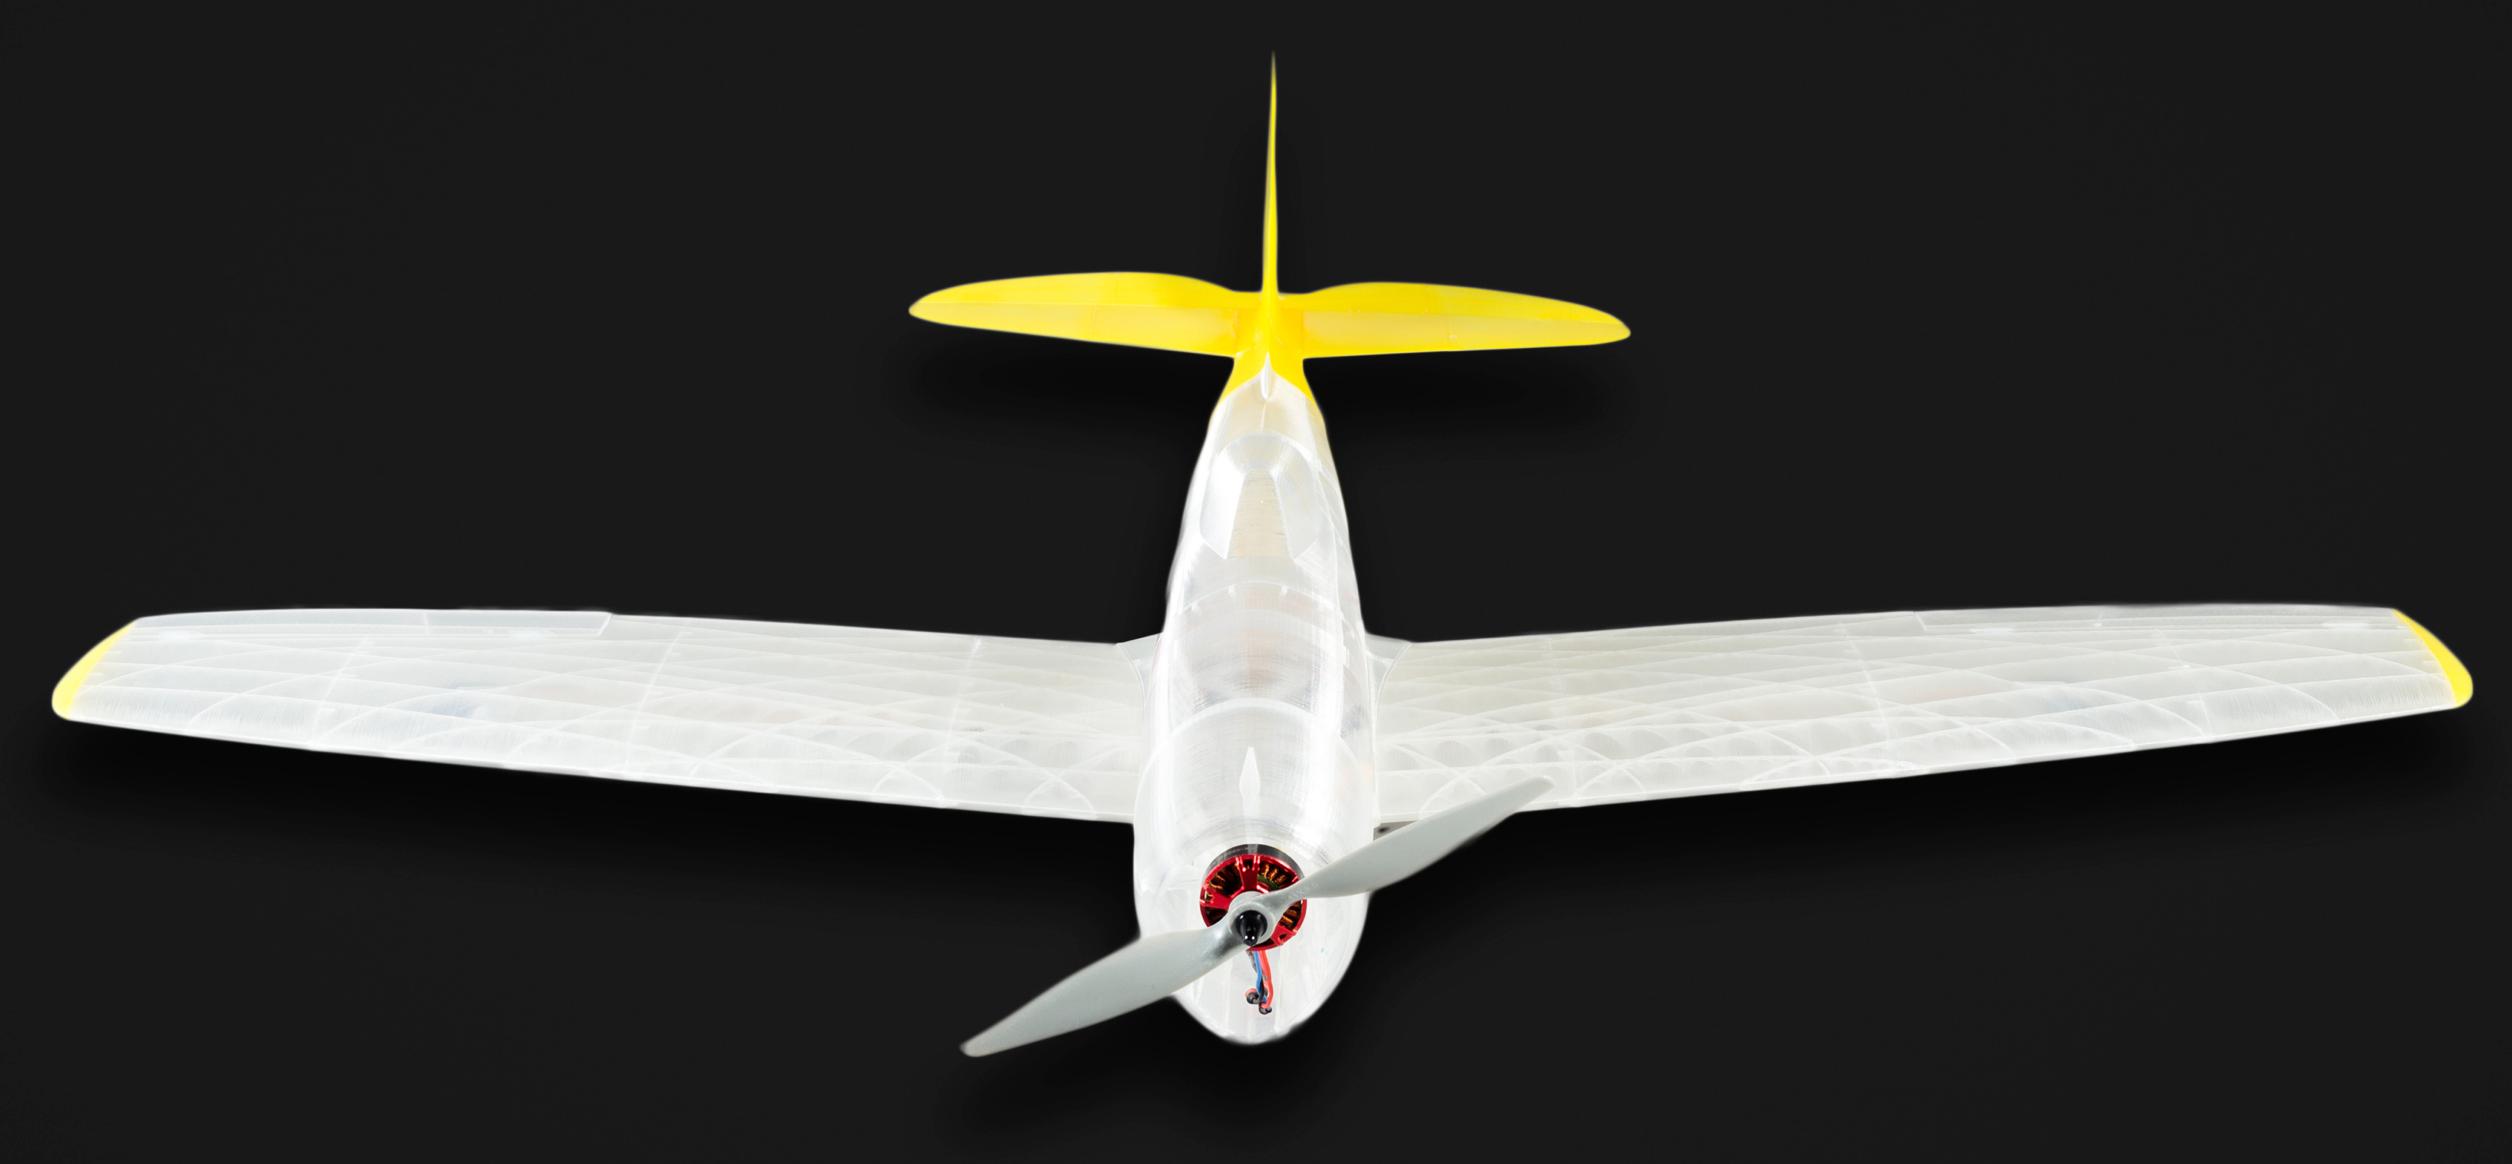 3D Lab Print P-47 Thunderbolt | Flite Test